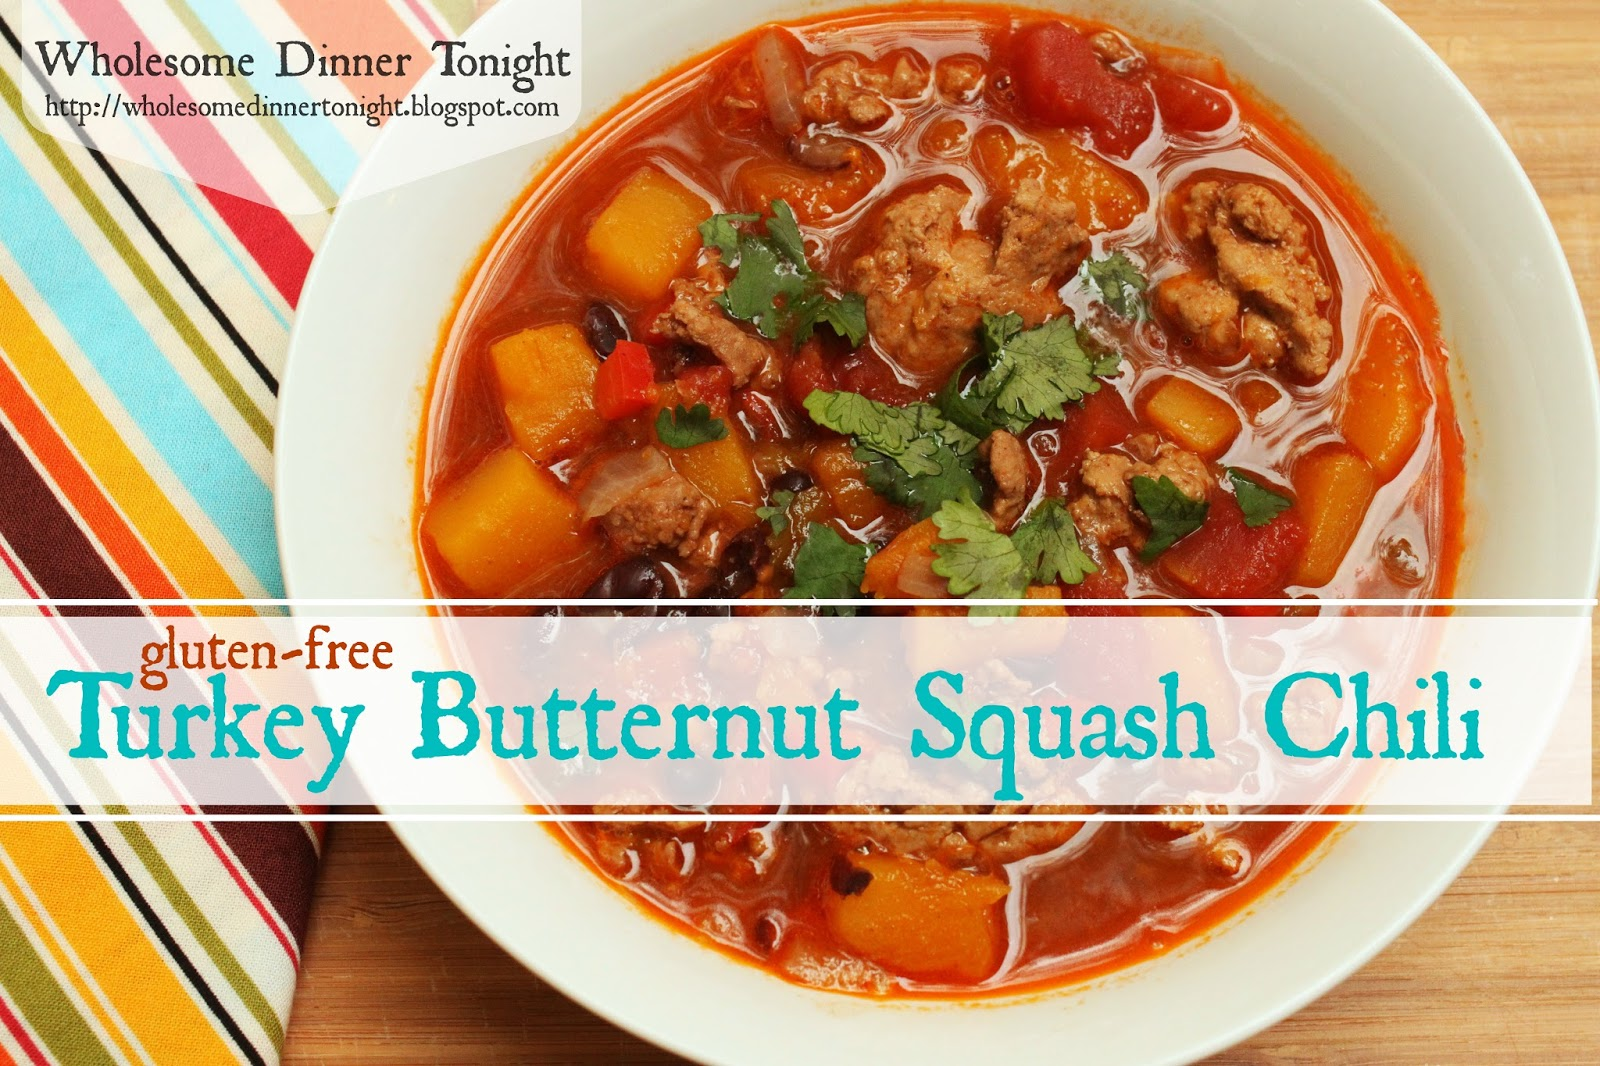 Wholesome Dinner Tonight: Turkey Butternut Squash Chili ...